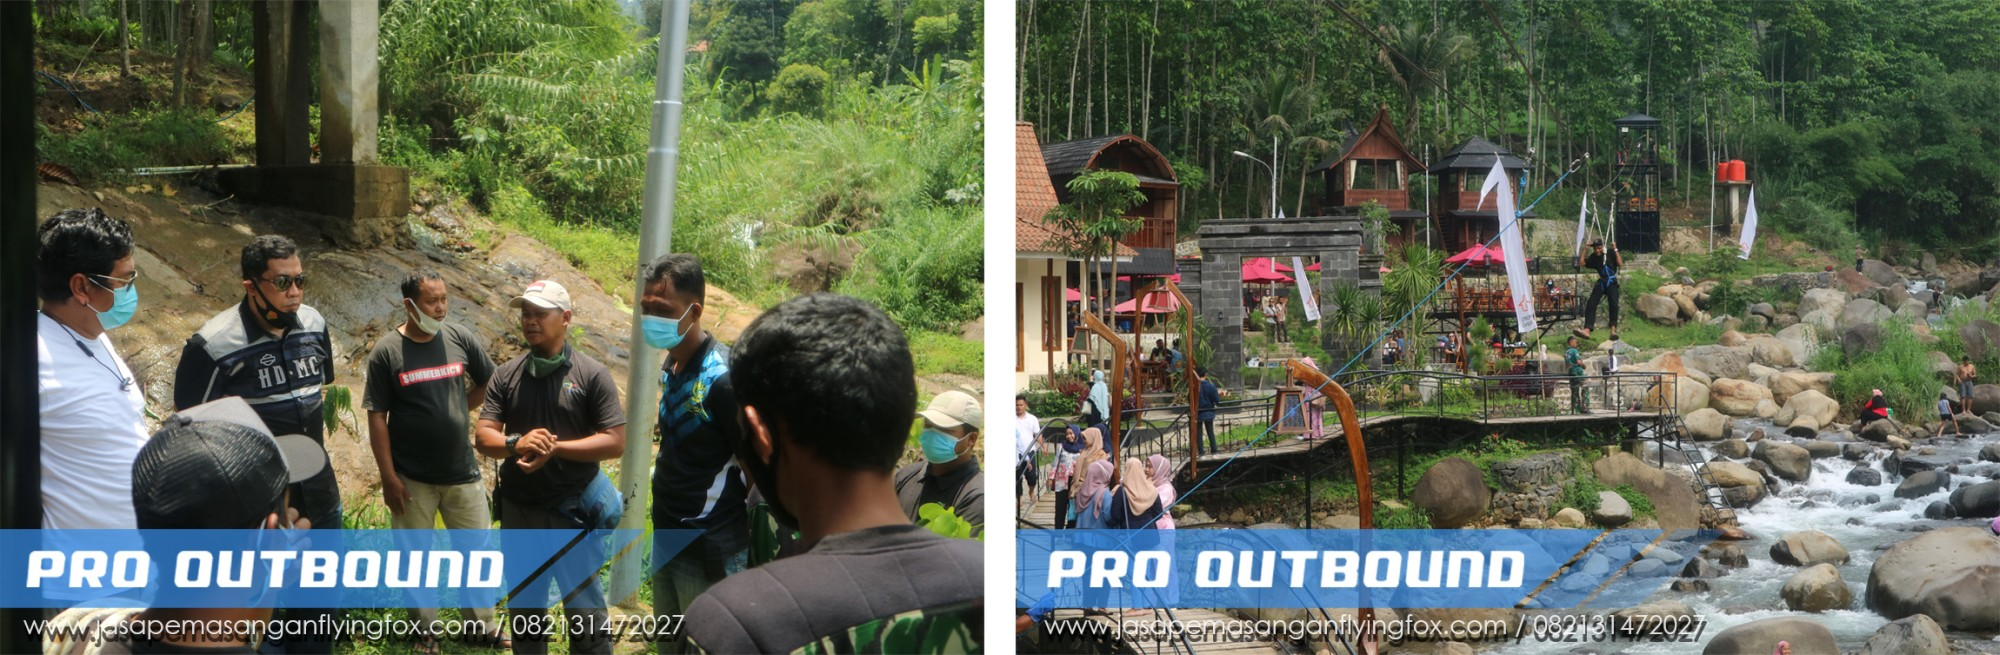 Pemasangan Wahana Flyingfox di Lokasi Wisata Pendopo Ciherang Bogor, Jasa Pembuatan Flying Fox Jawa Barat - 082131472027 (2)